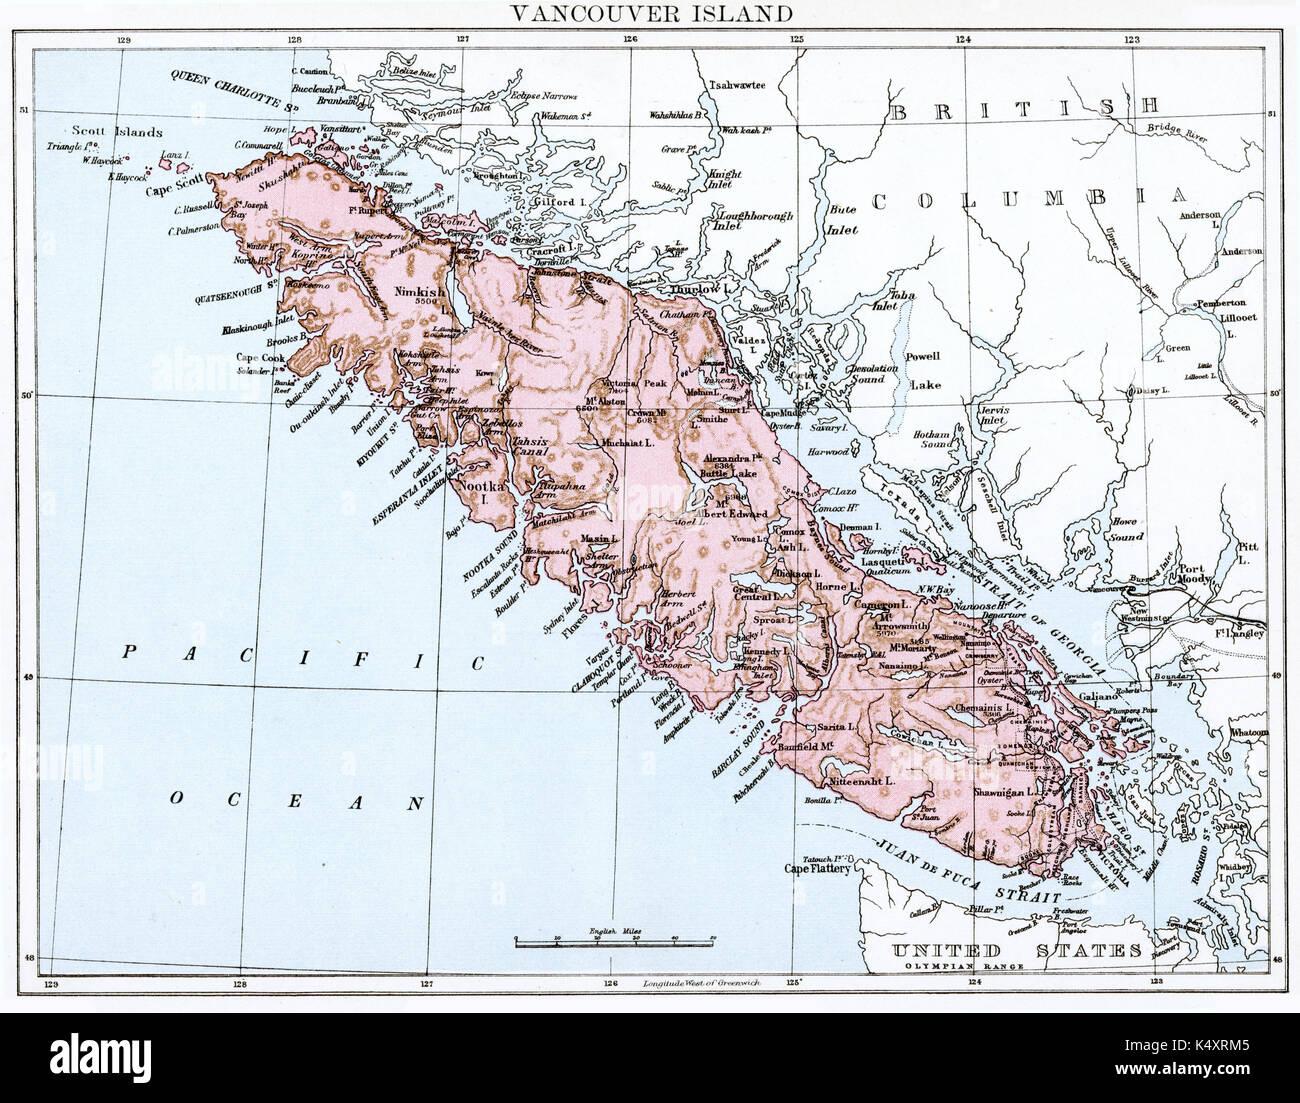 Islands Of Canada Map.Antique Map Circa 1875 Of Canada Vancouver Islands Stock Photo